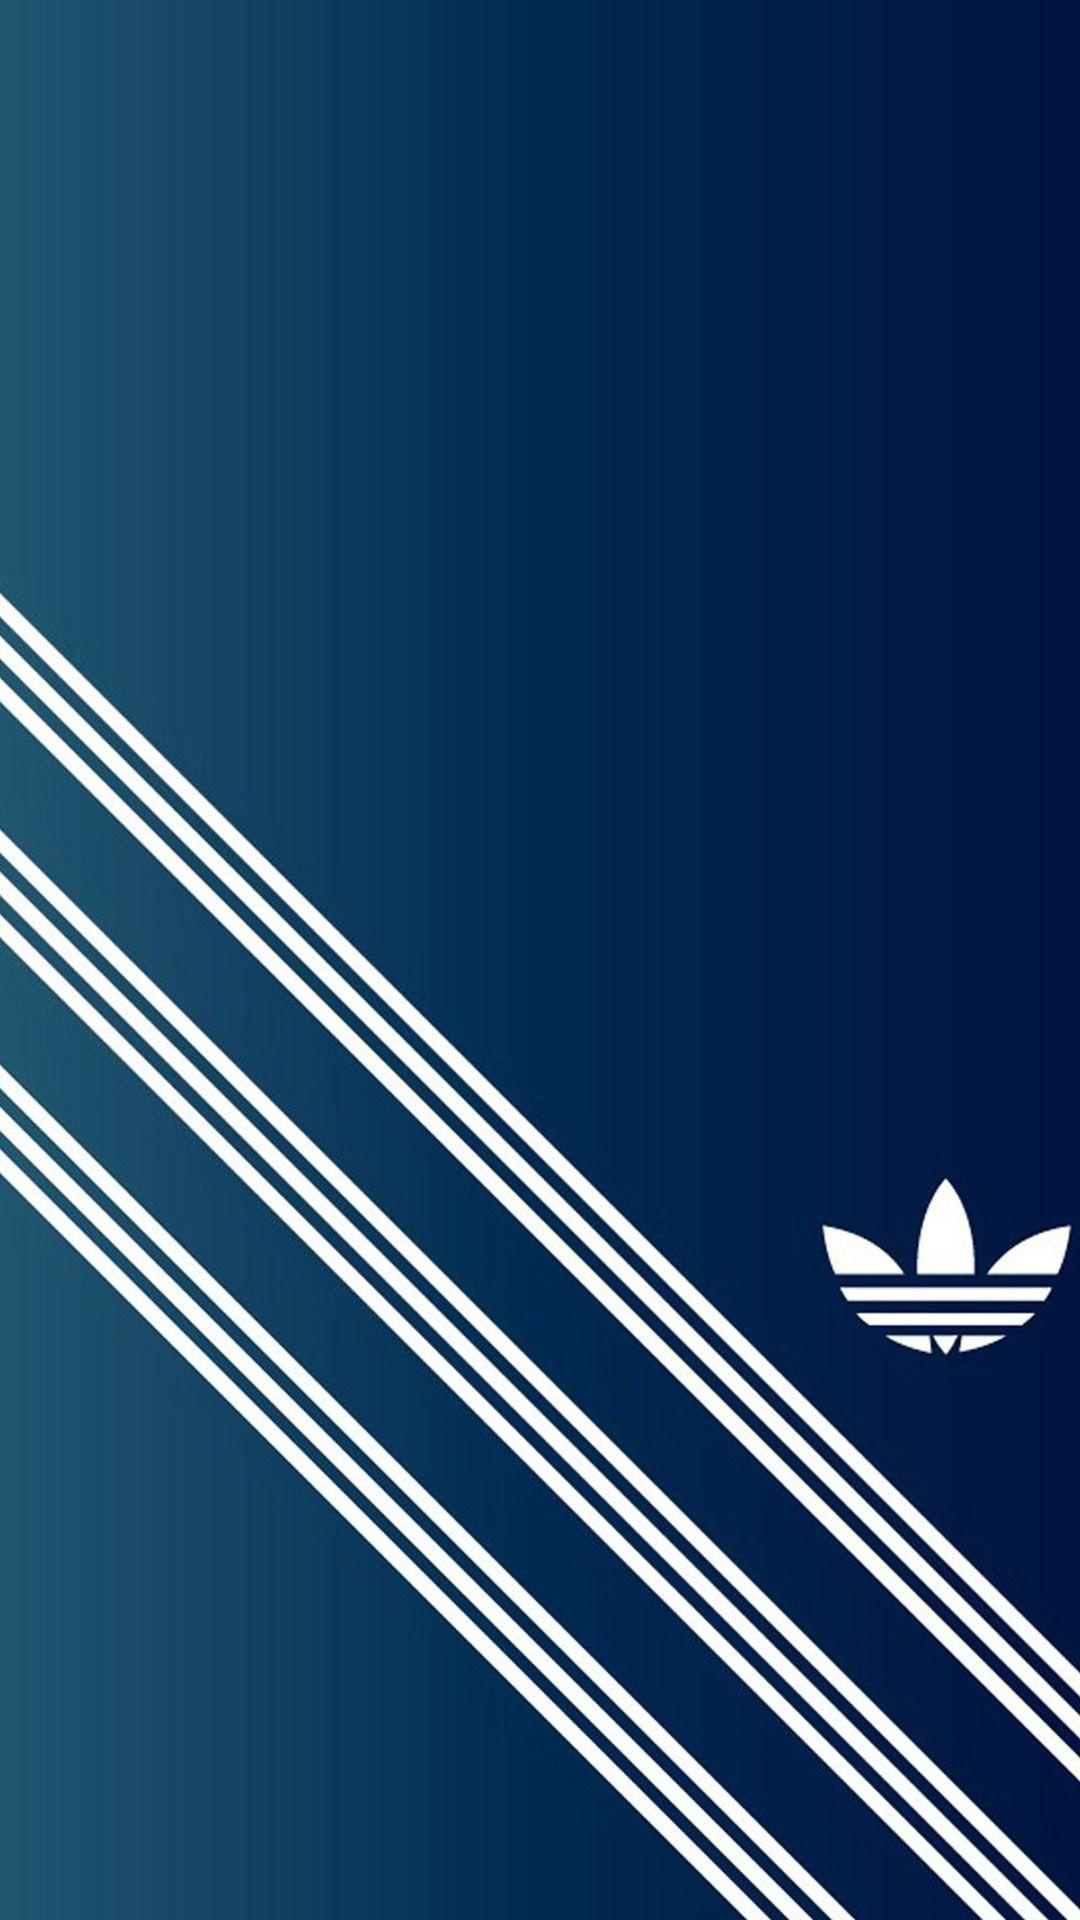 Most Inspiring Wallpaper Adidas Iphone 6s Plus - 5f241170bc0e4fd5a8b518bcbd4afea3  Pic_261019      .jpg